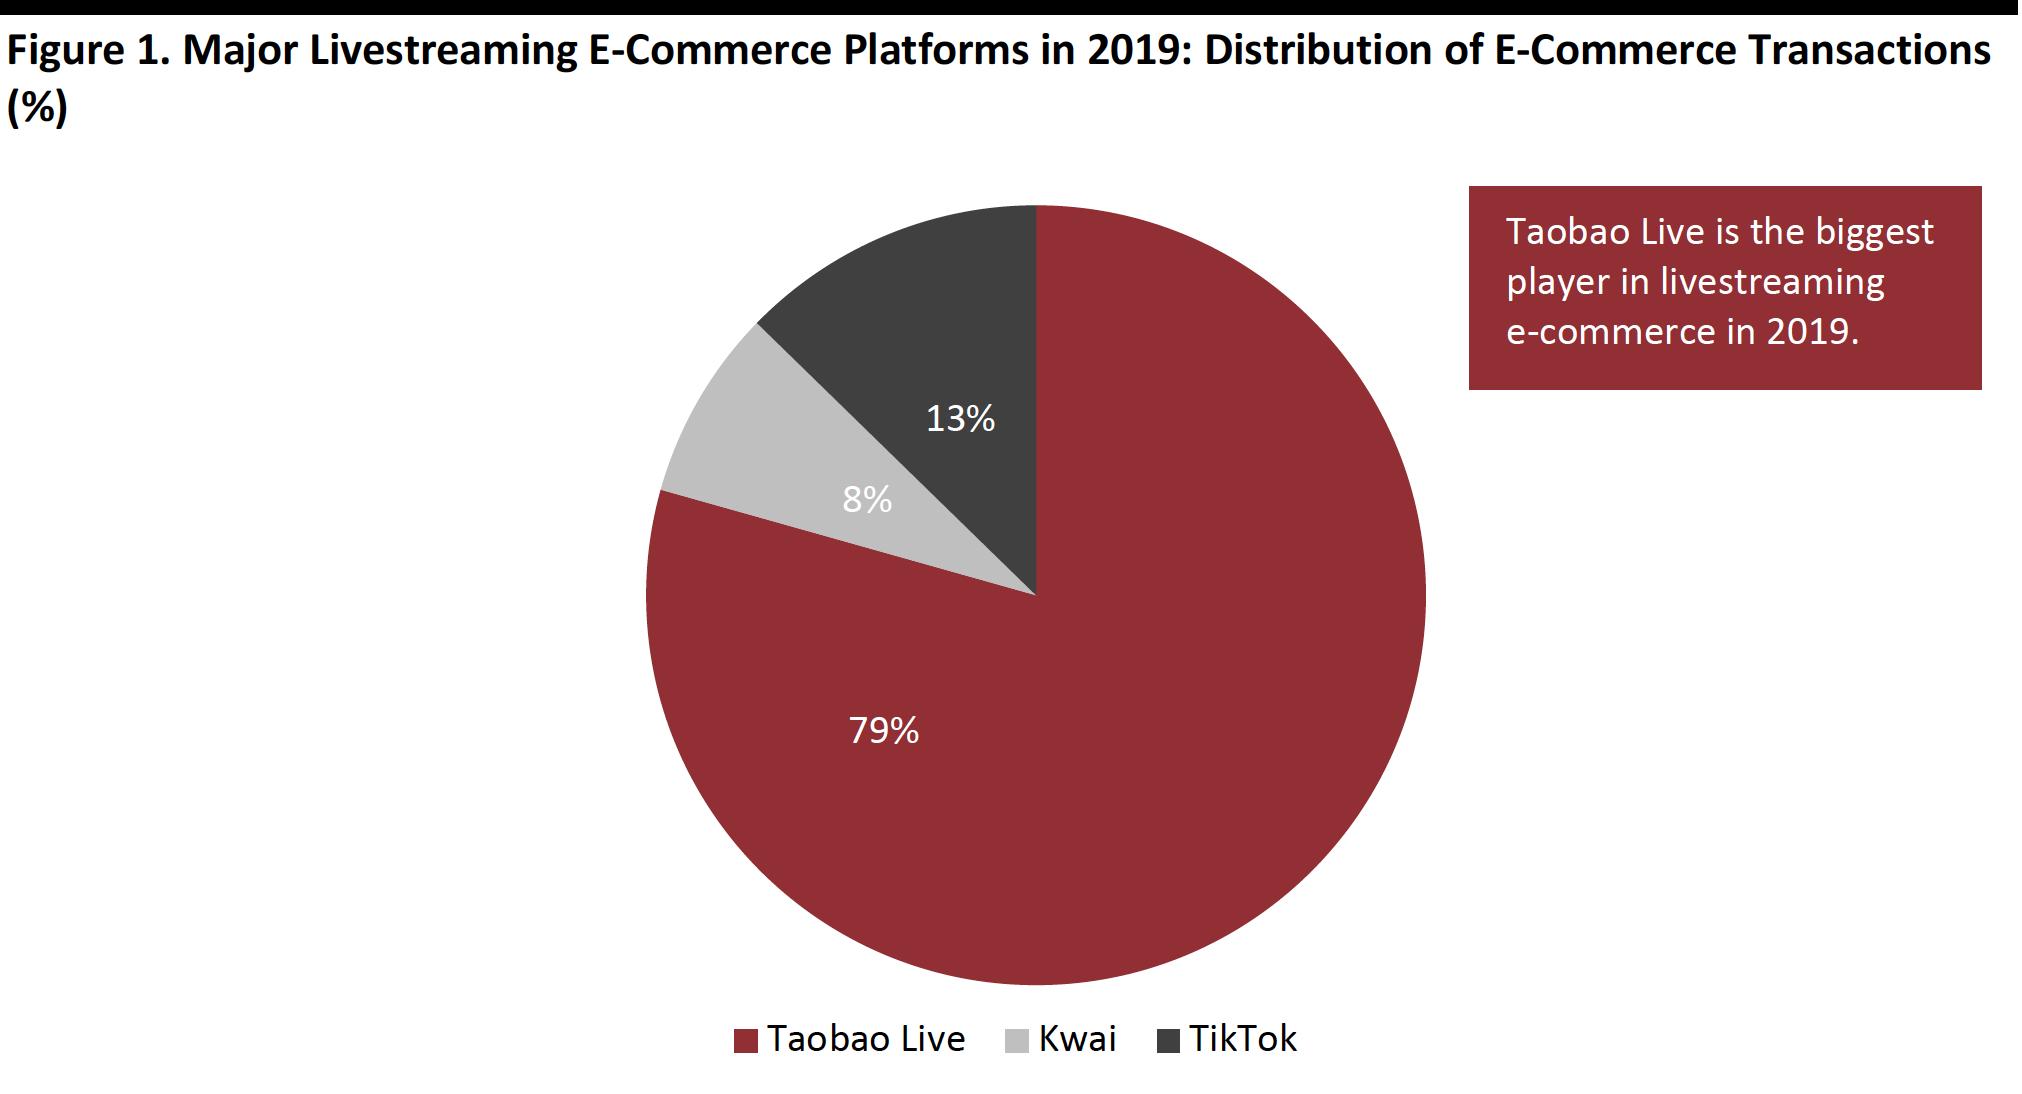 Major Livestreaming E-Commerce Platforms in 2019: Distribution of E-Commerce Transactions (%)